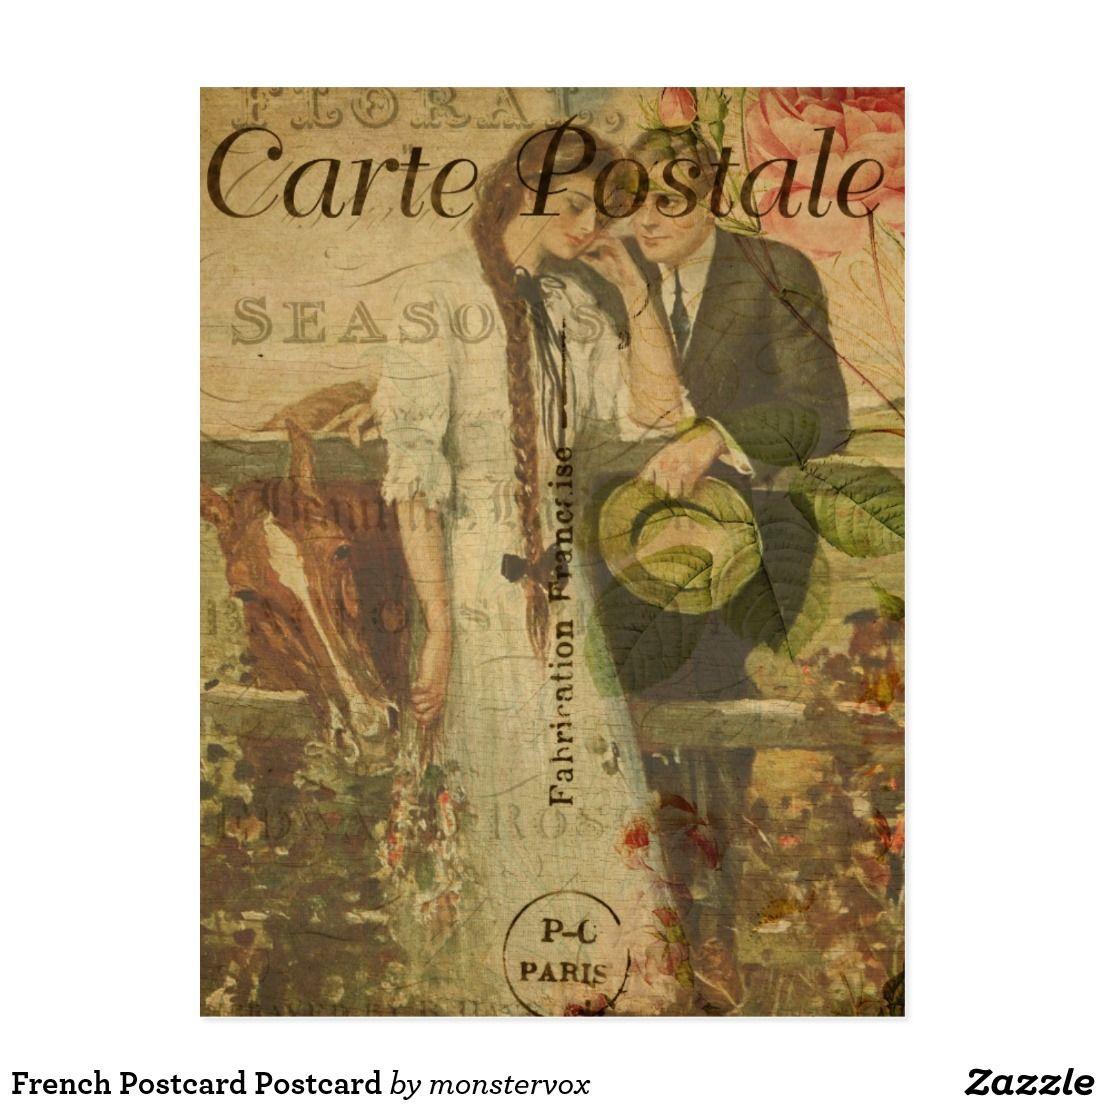 French Postcard Postcard FrenchPostcard CartePostale